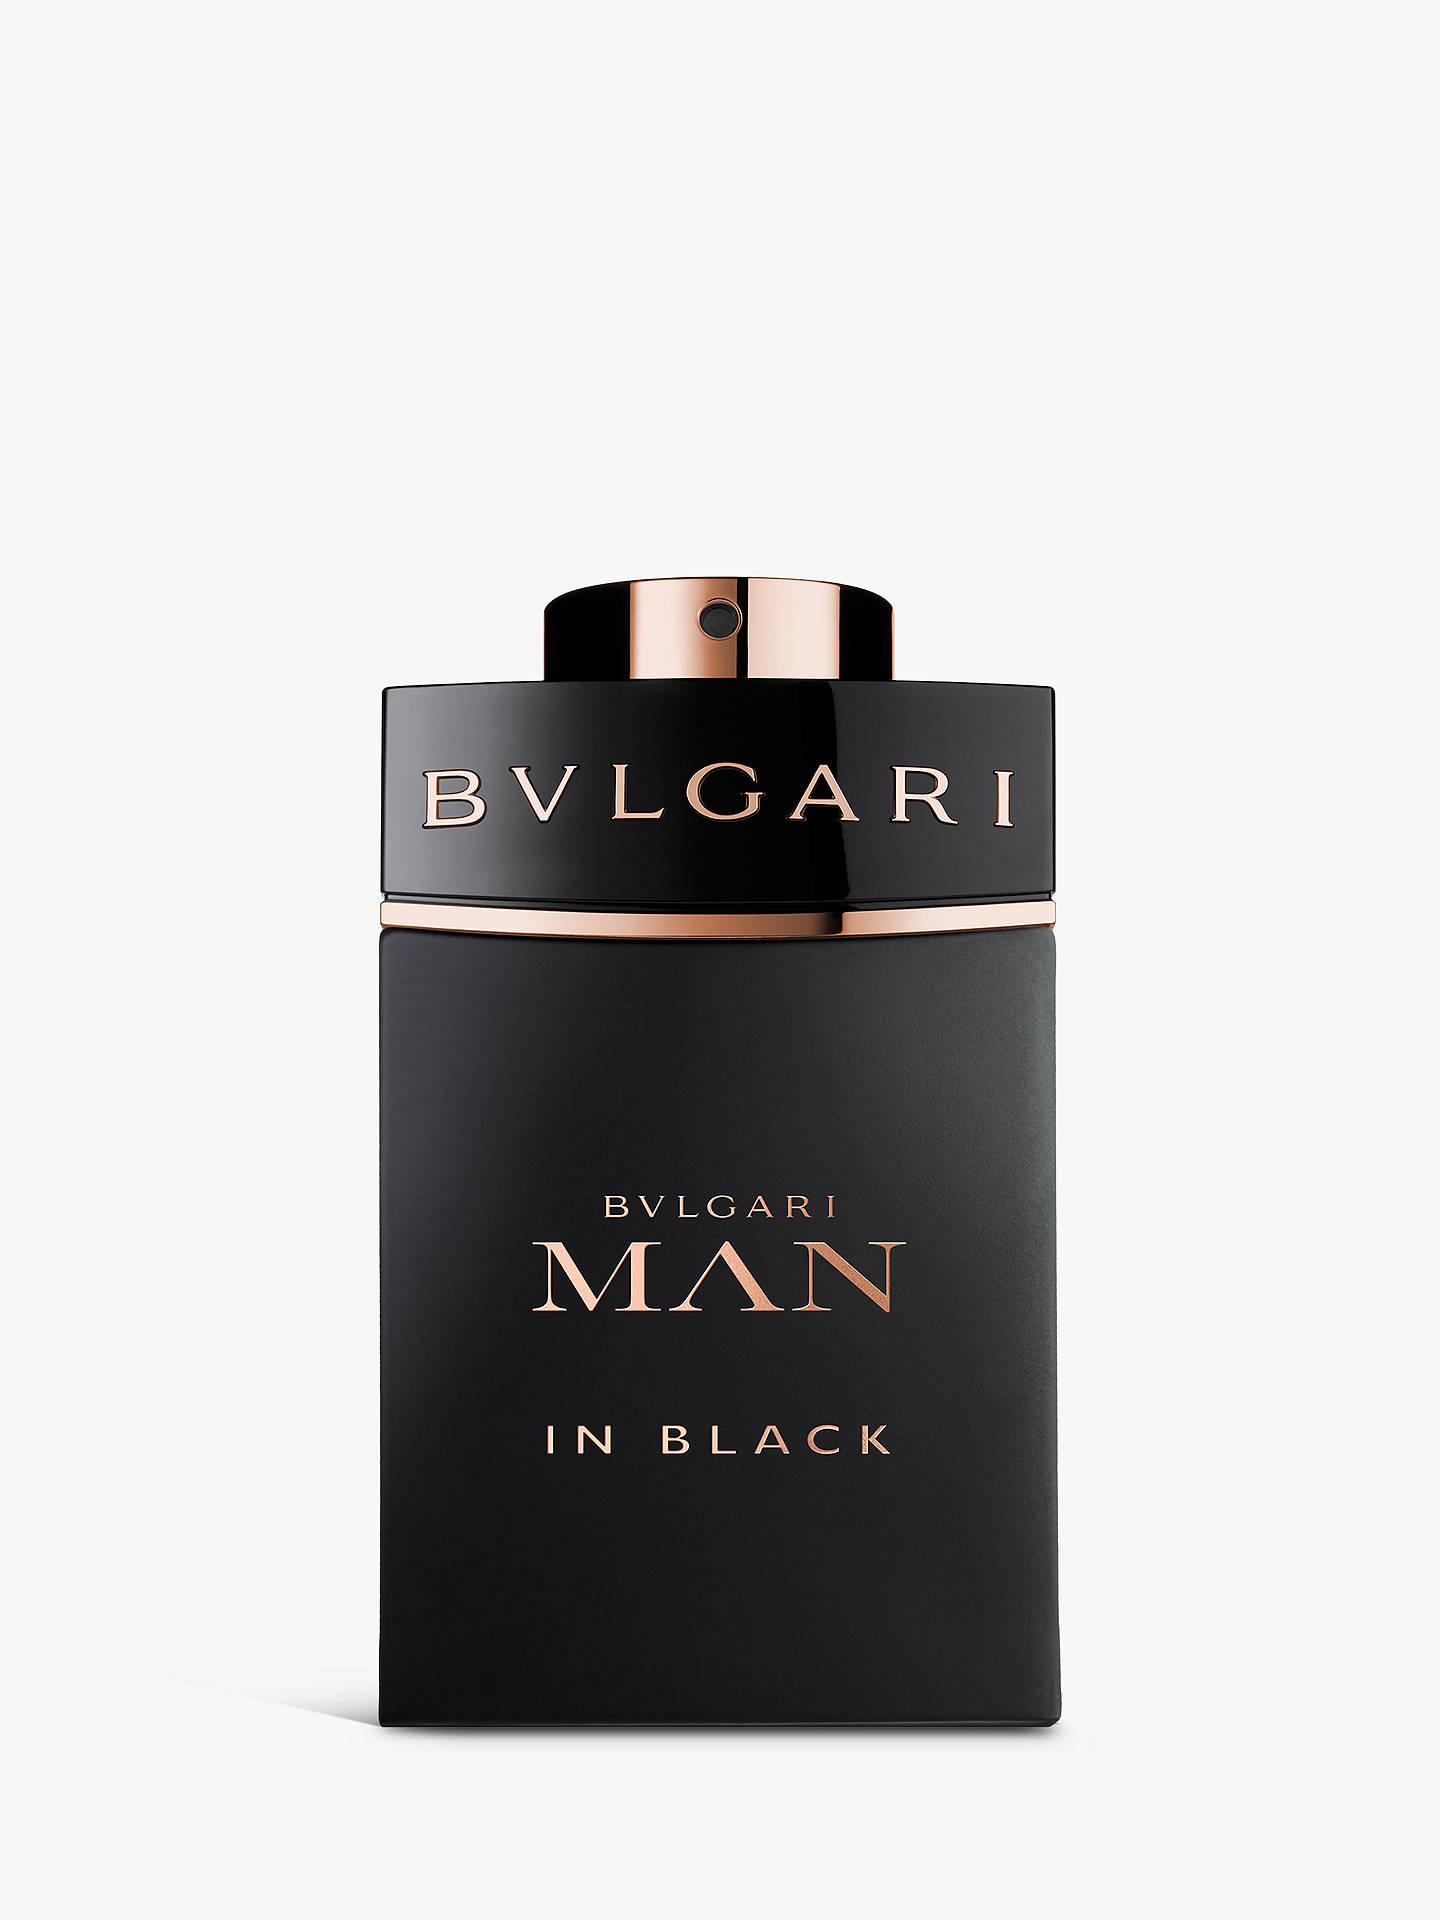 eb26dac75c0 BVLGARI Man In Black Eau de Parfum at John Lewis   Partners